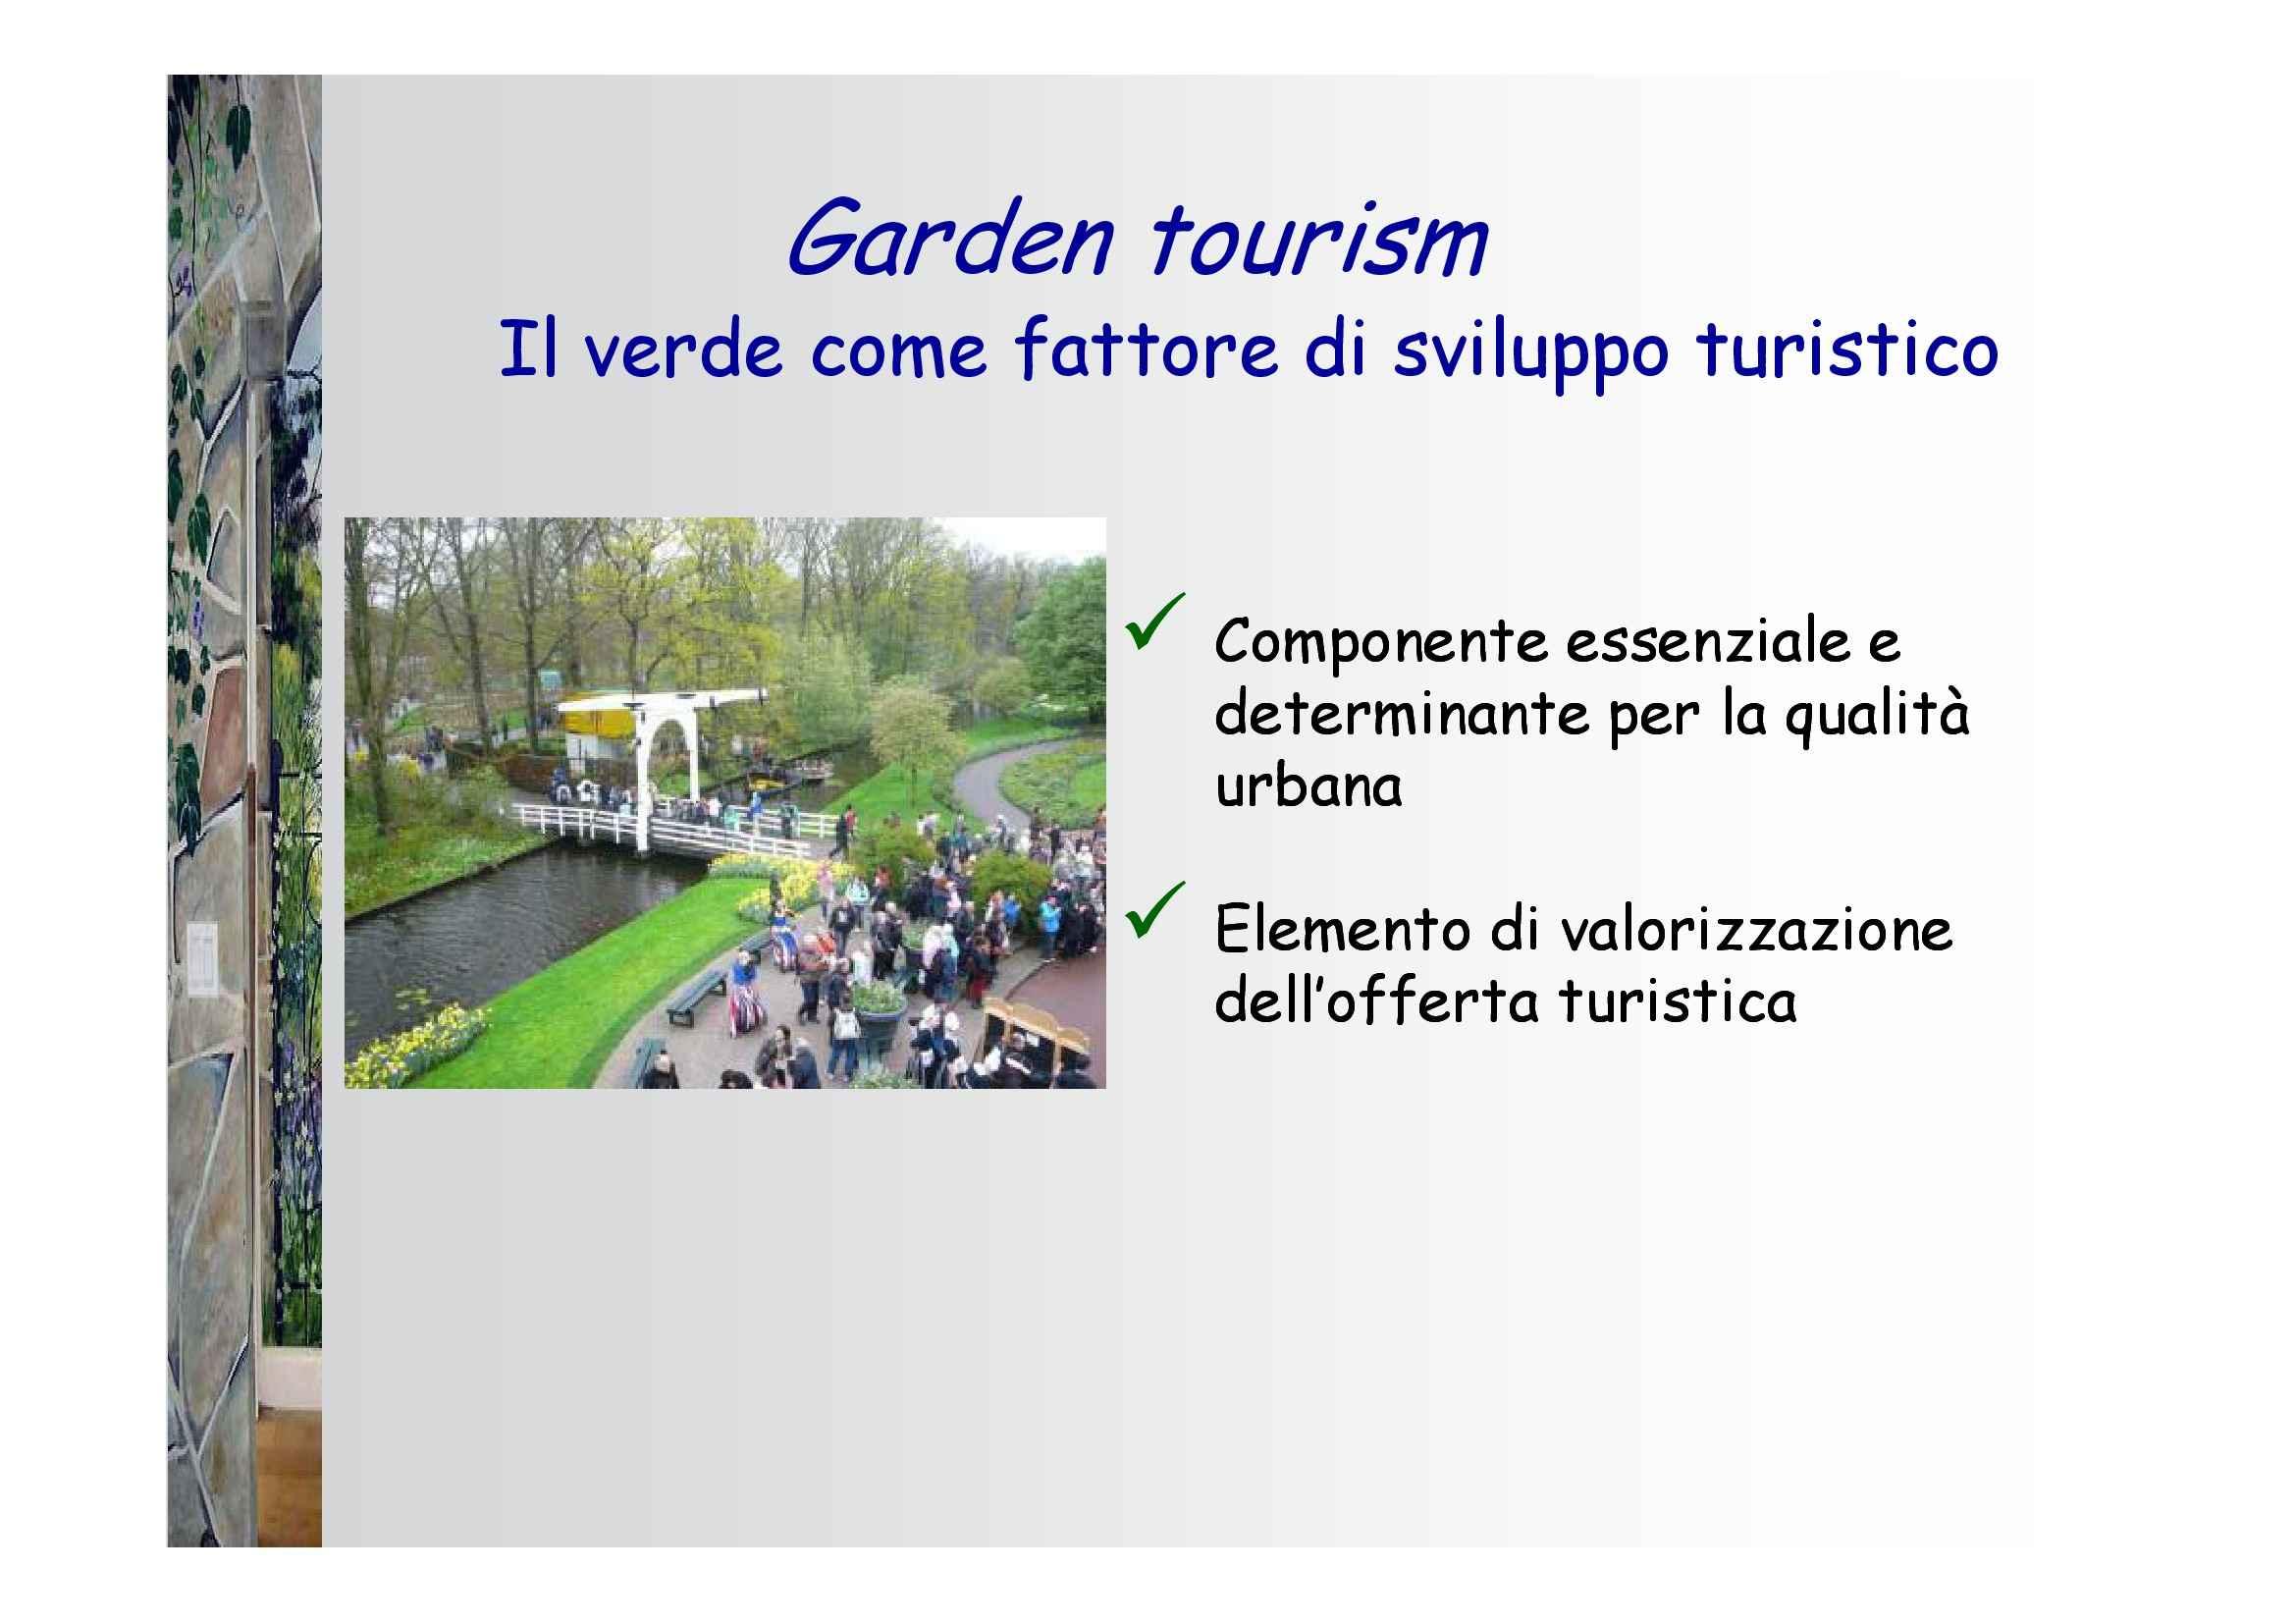 Dispensa di Piante e verde urbano, Piante e turismo